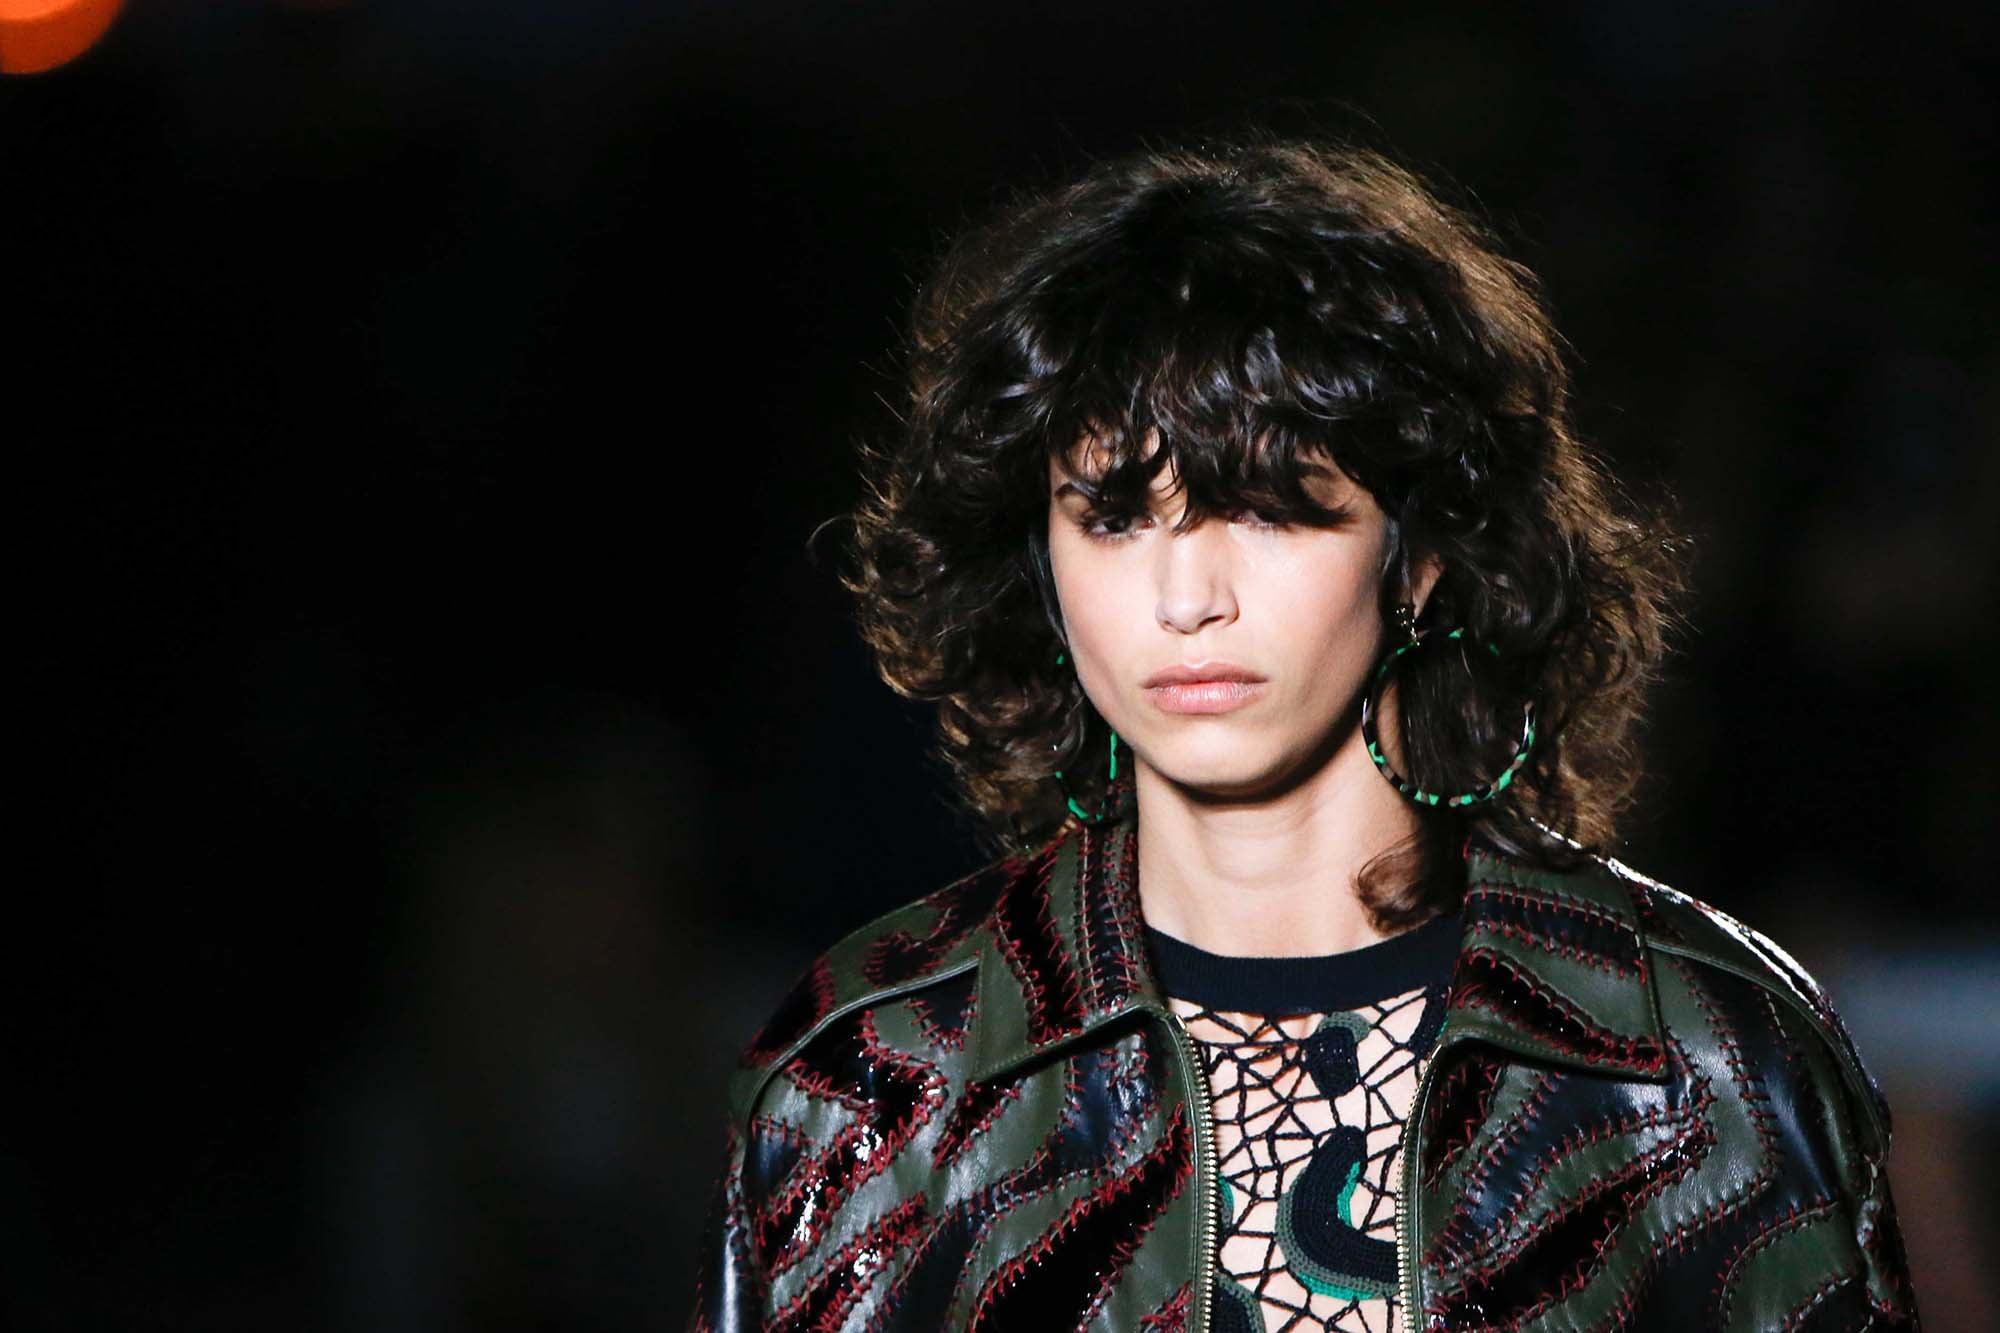 Tipos de cara: 14 Peinados que resaltan tus mejores características